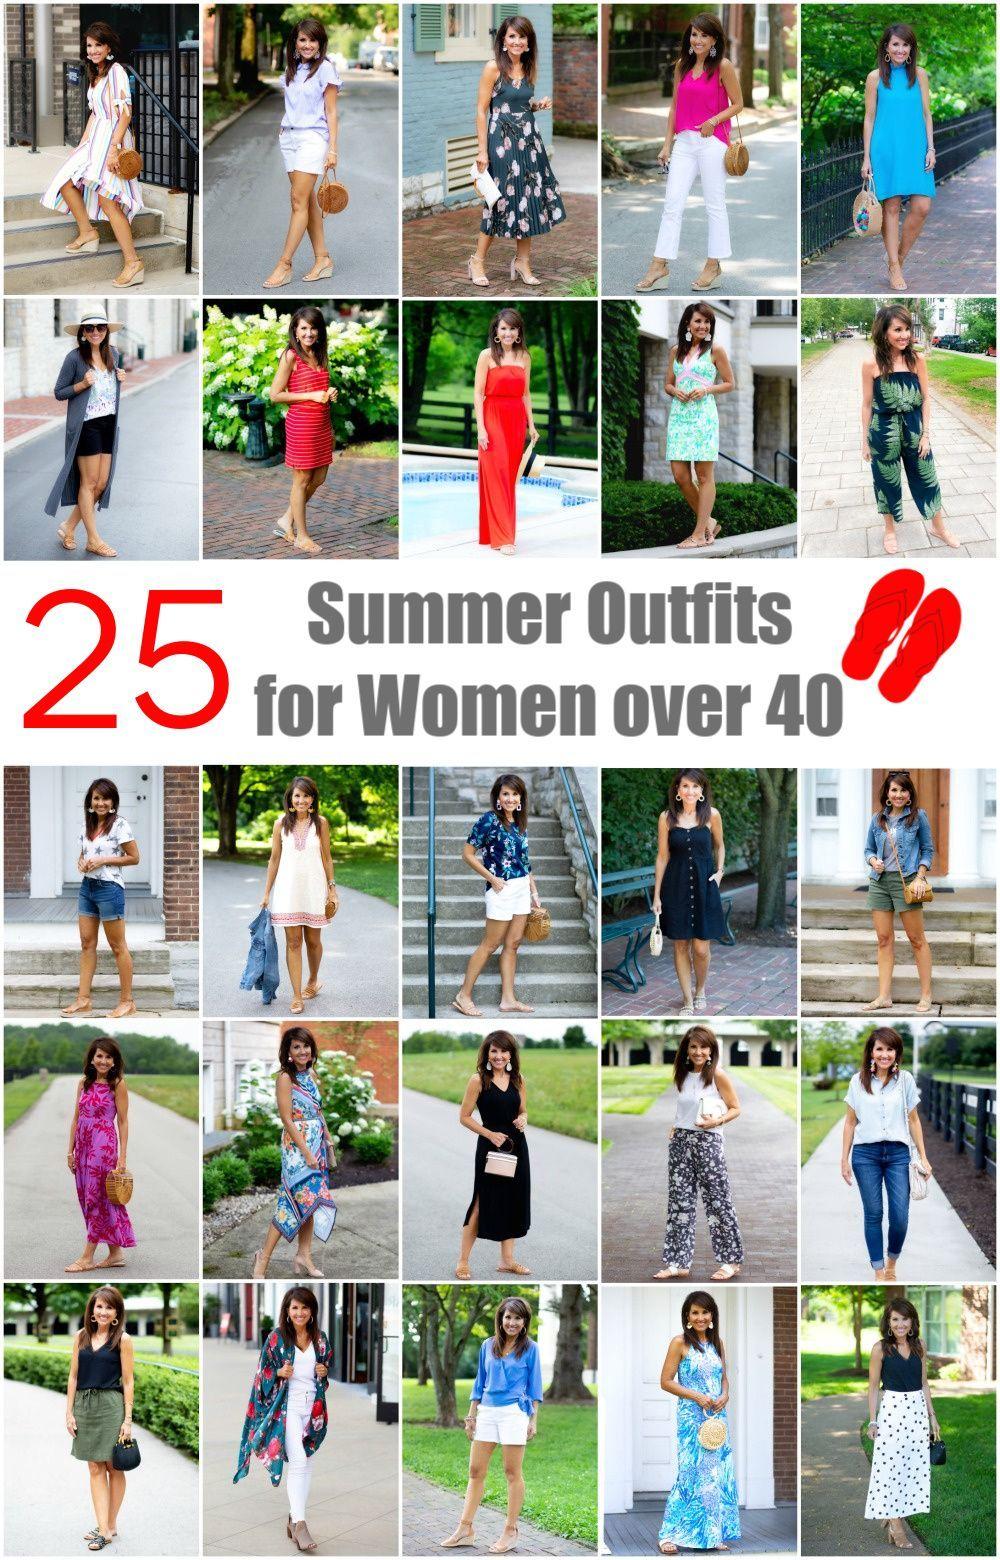 25 Summer Outfits for Women Over 40-Recap   summer outfits women over 40 beach